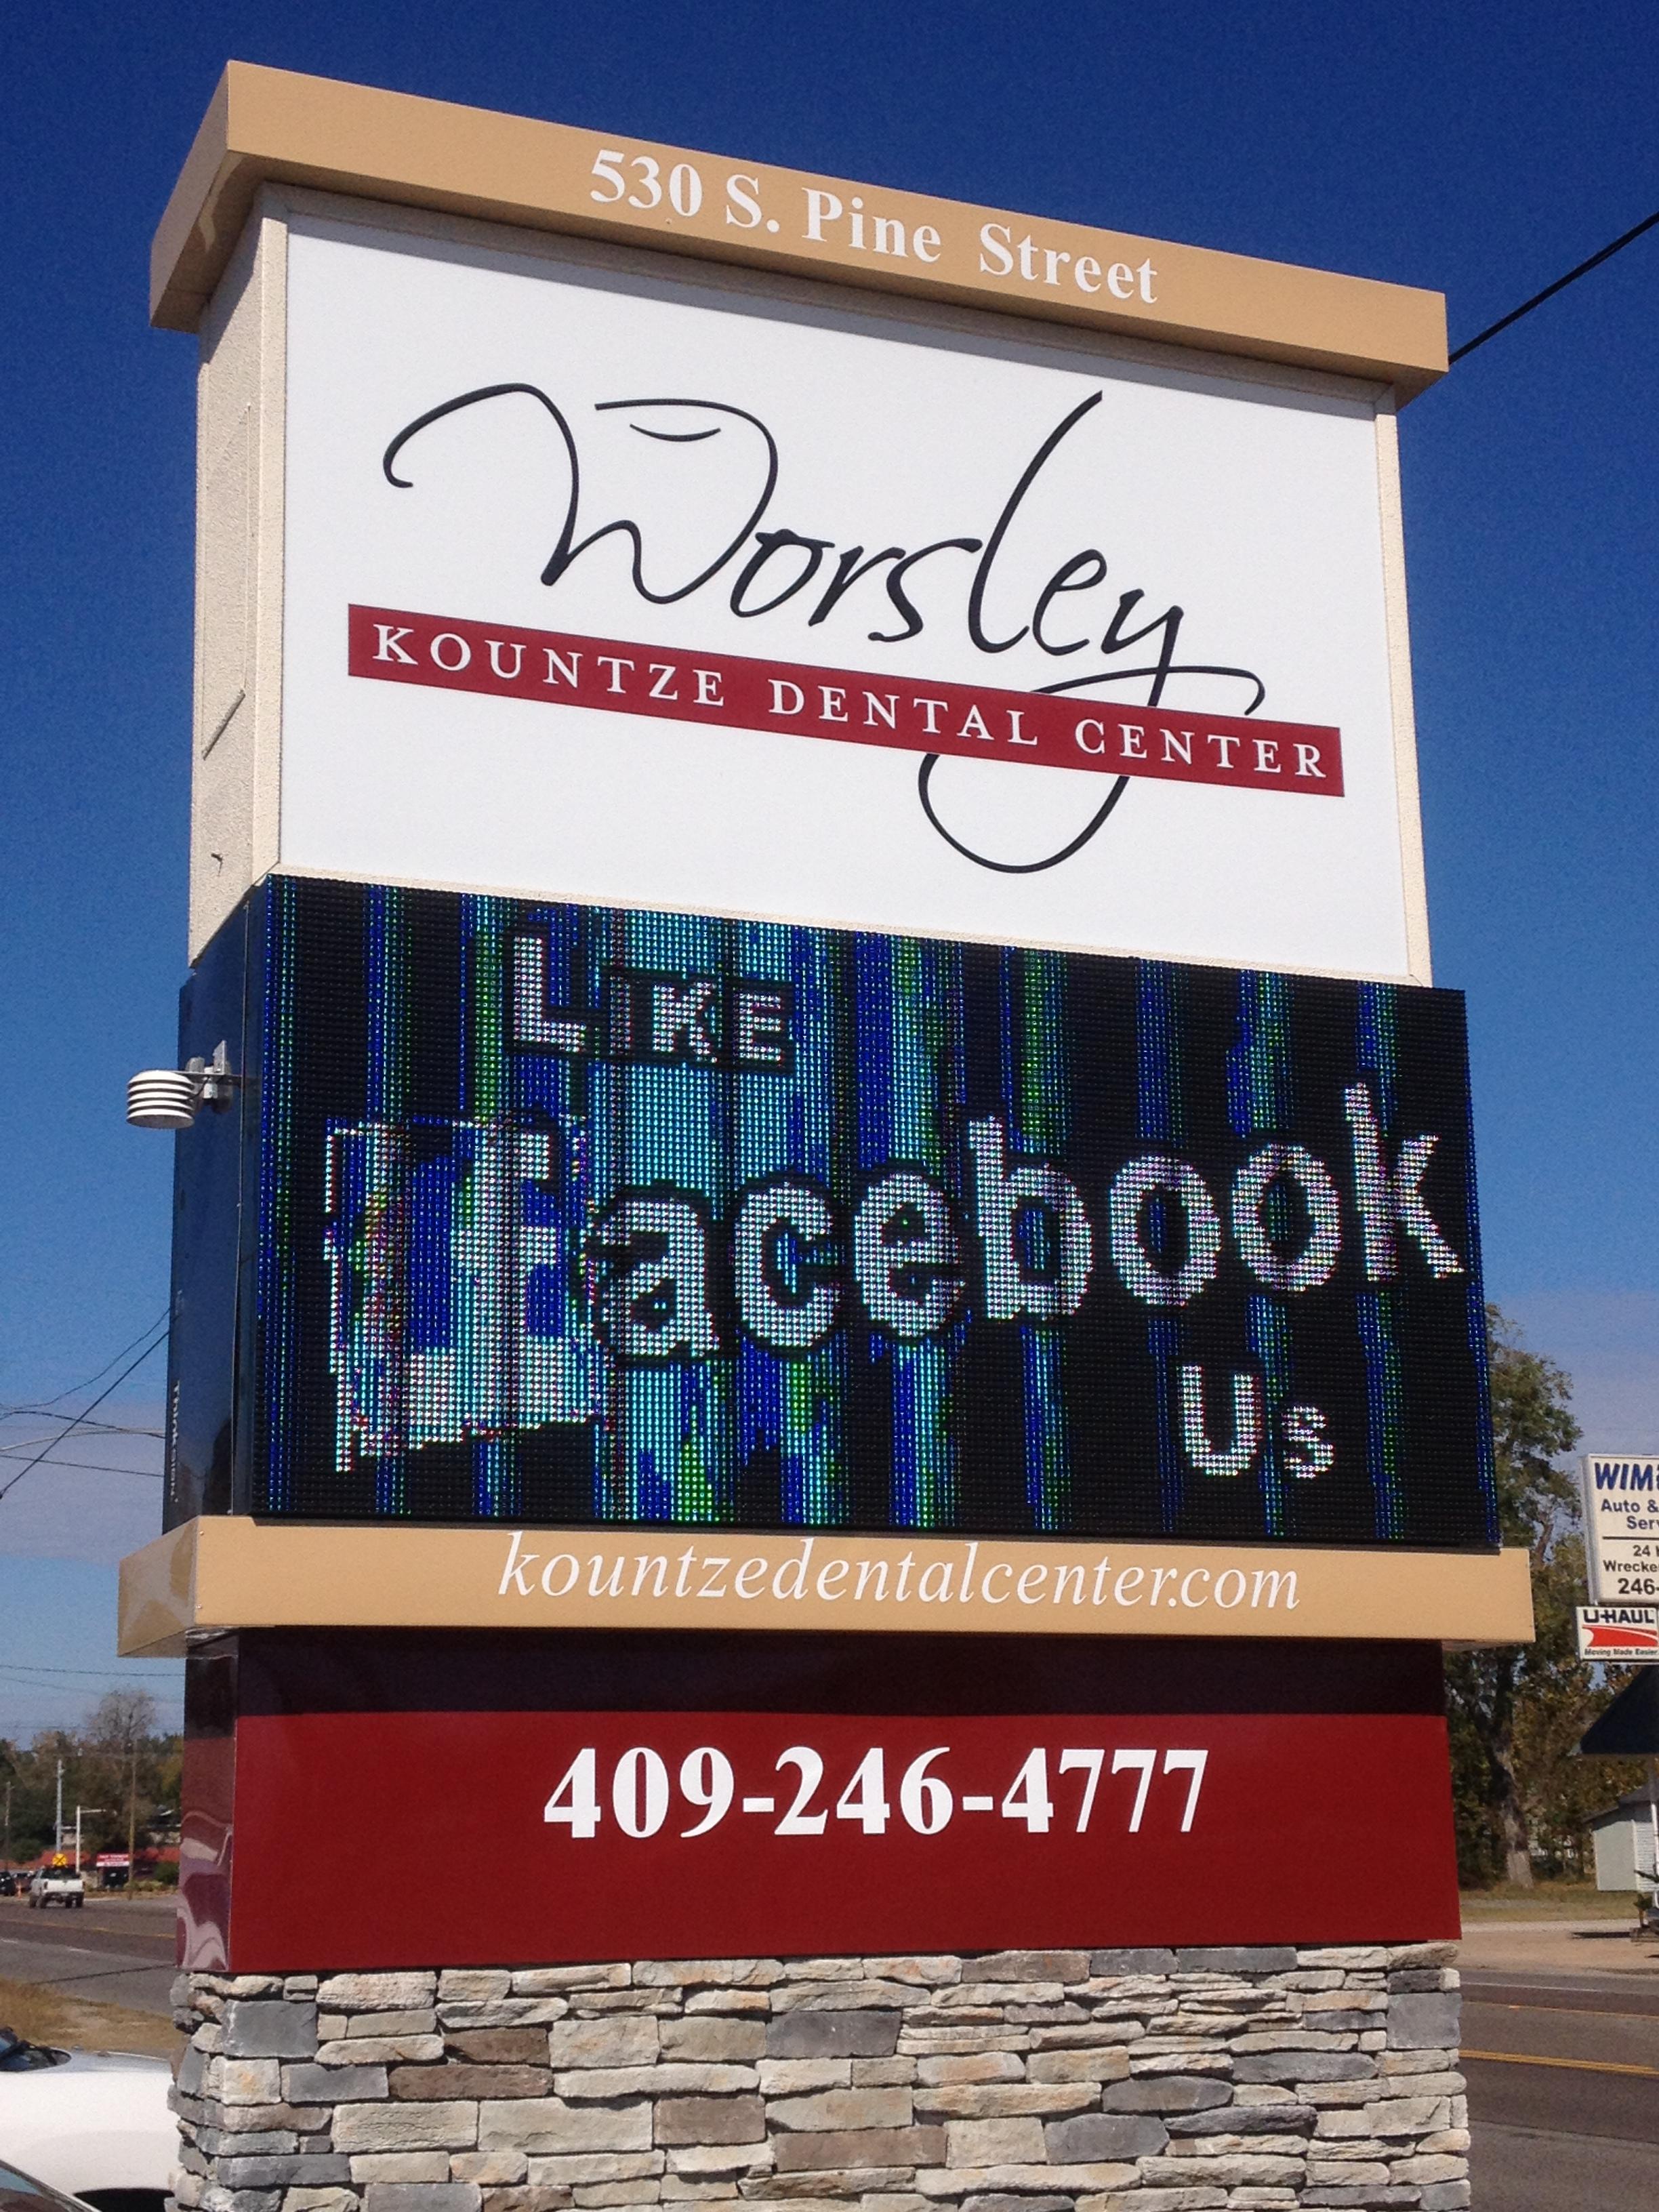 Worsley Dental Center - I.D. Monument & LED Digital Sign